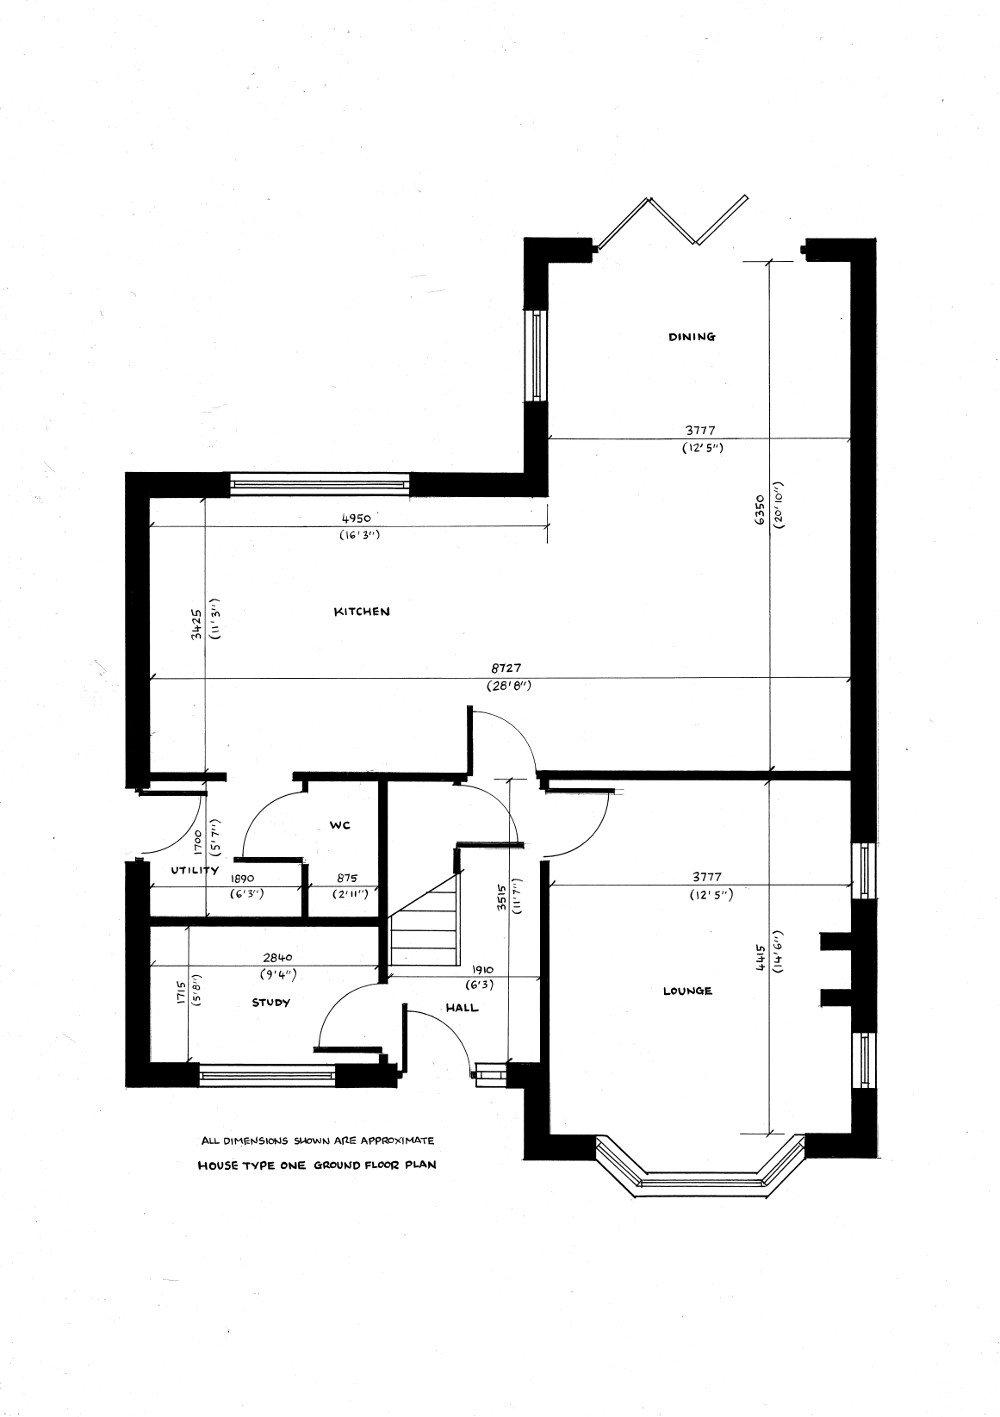 House type one. Ground floor plan._11072019